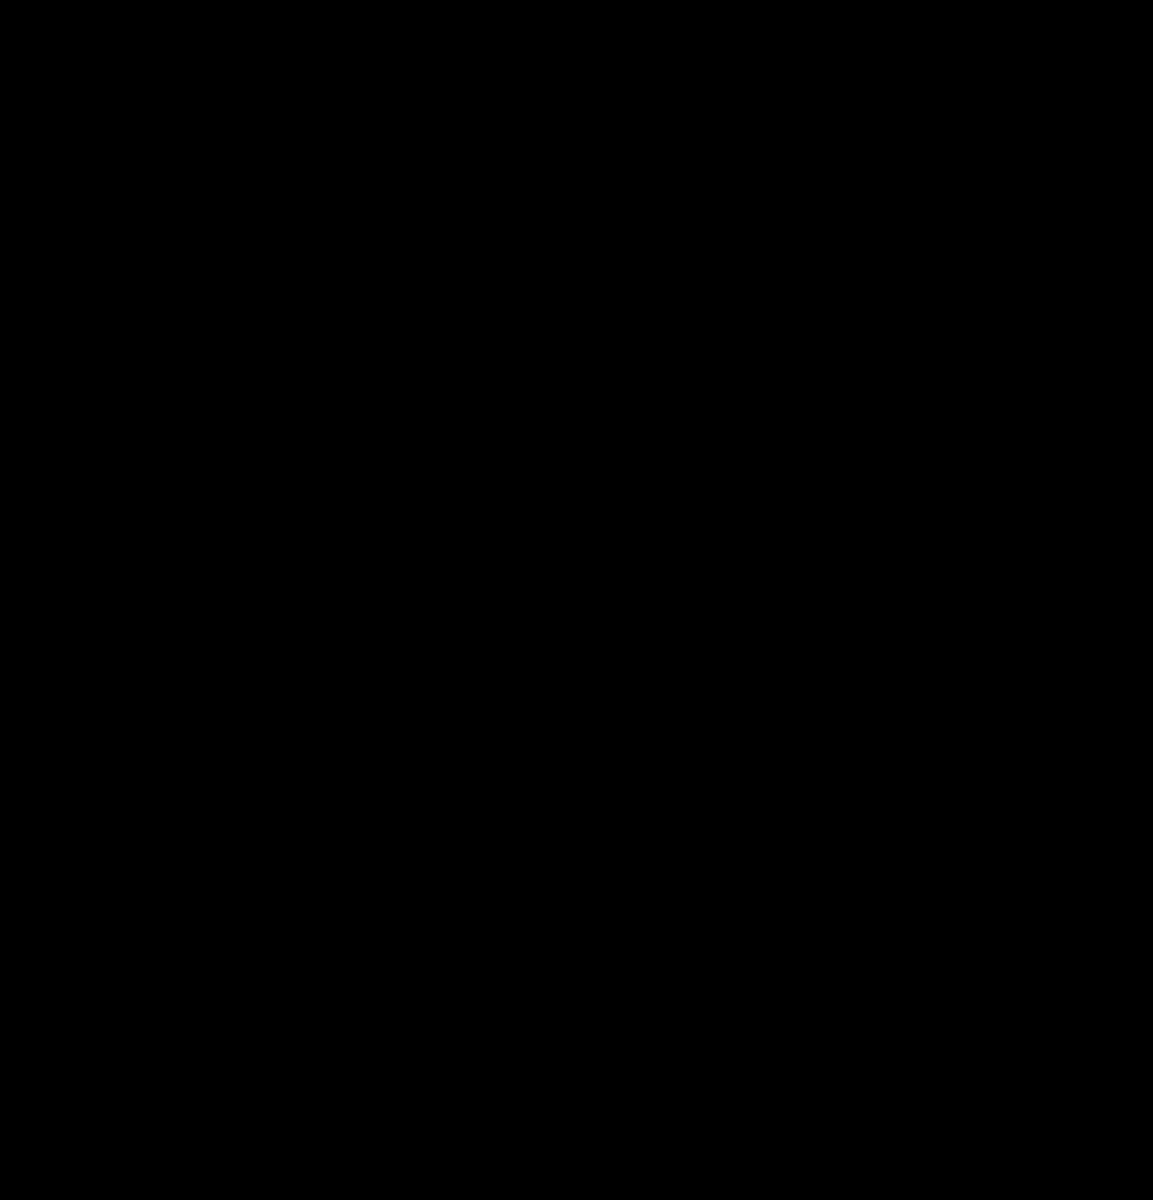 LED Nachtlampje: Roze / rainbow unicorn / eenhoorn – Sass & Belle – kawaii